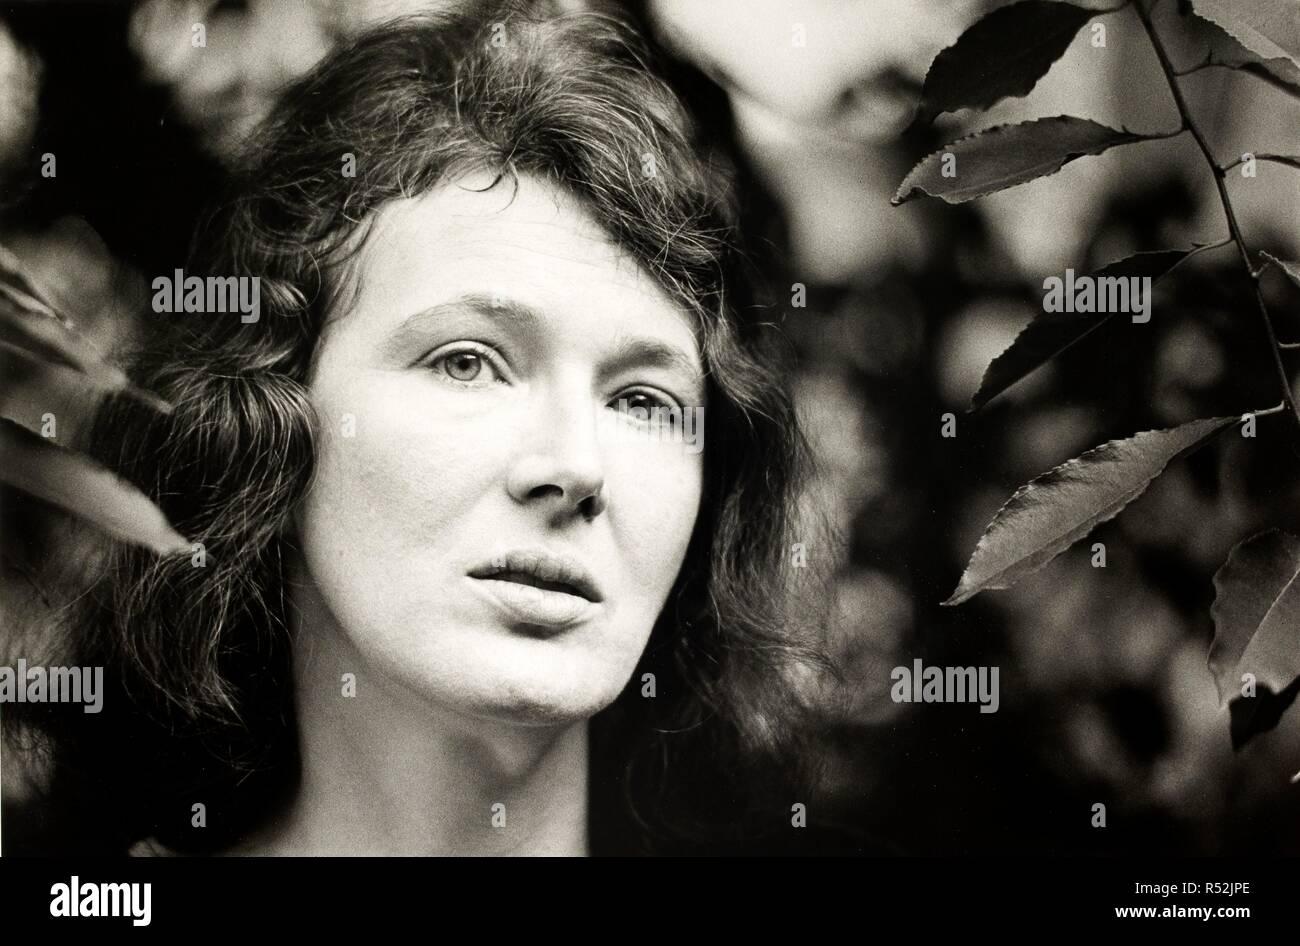 Angela Carter 1976. Angela Carter 1976.  Photograph by Fay Godwin. . Source: FG2638-2-19a. - Stock Image